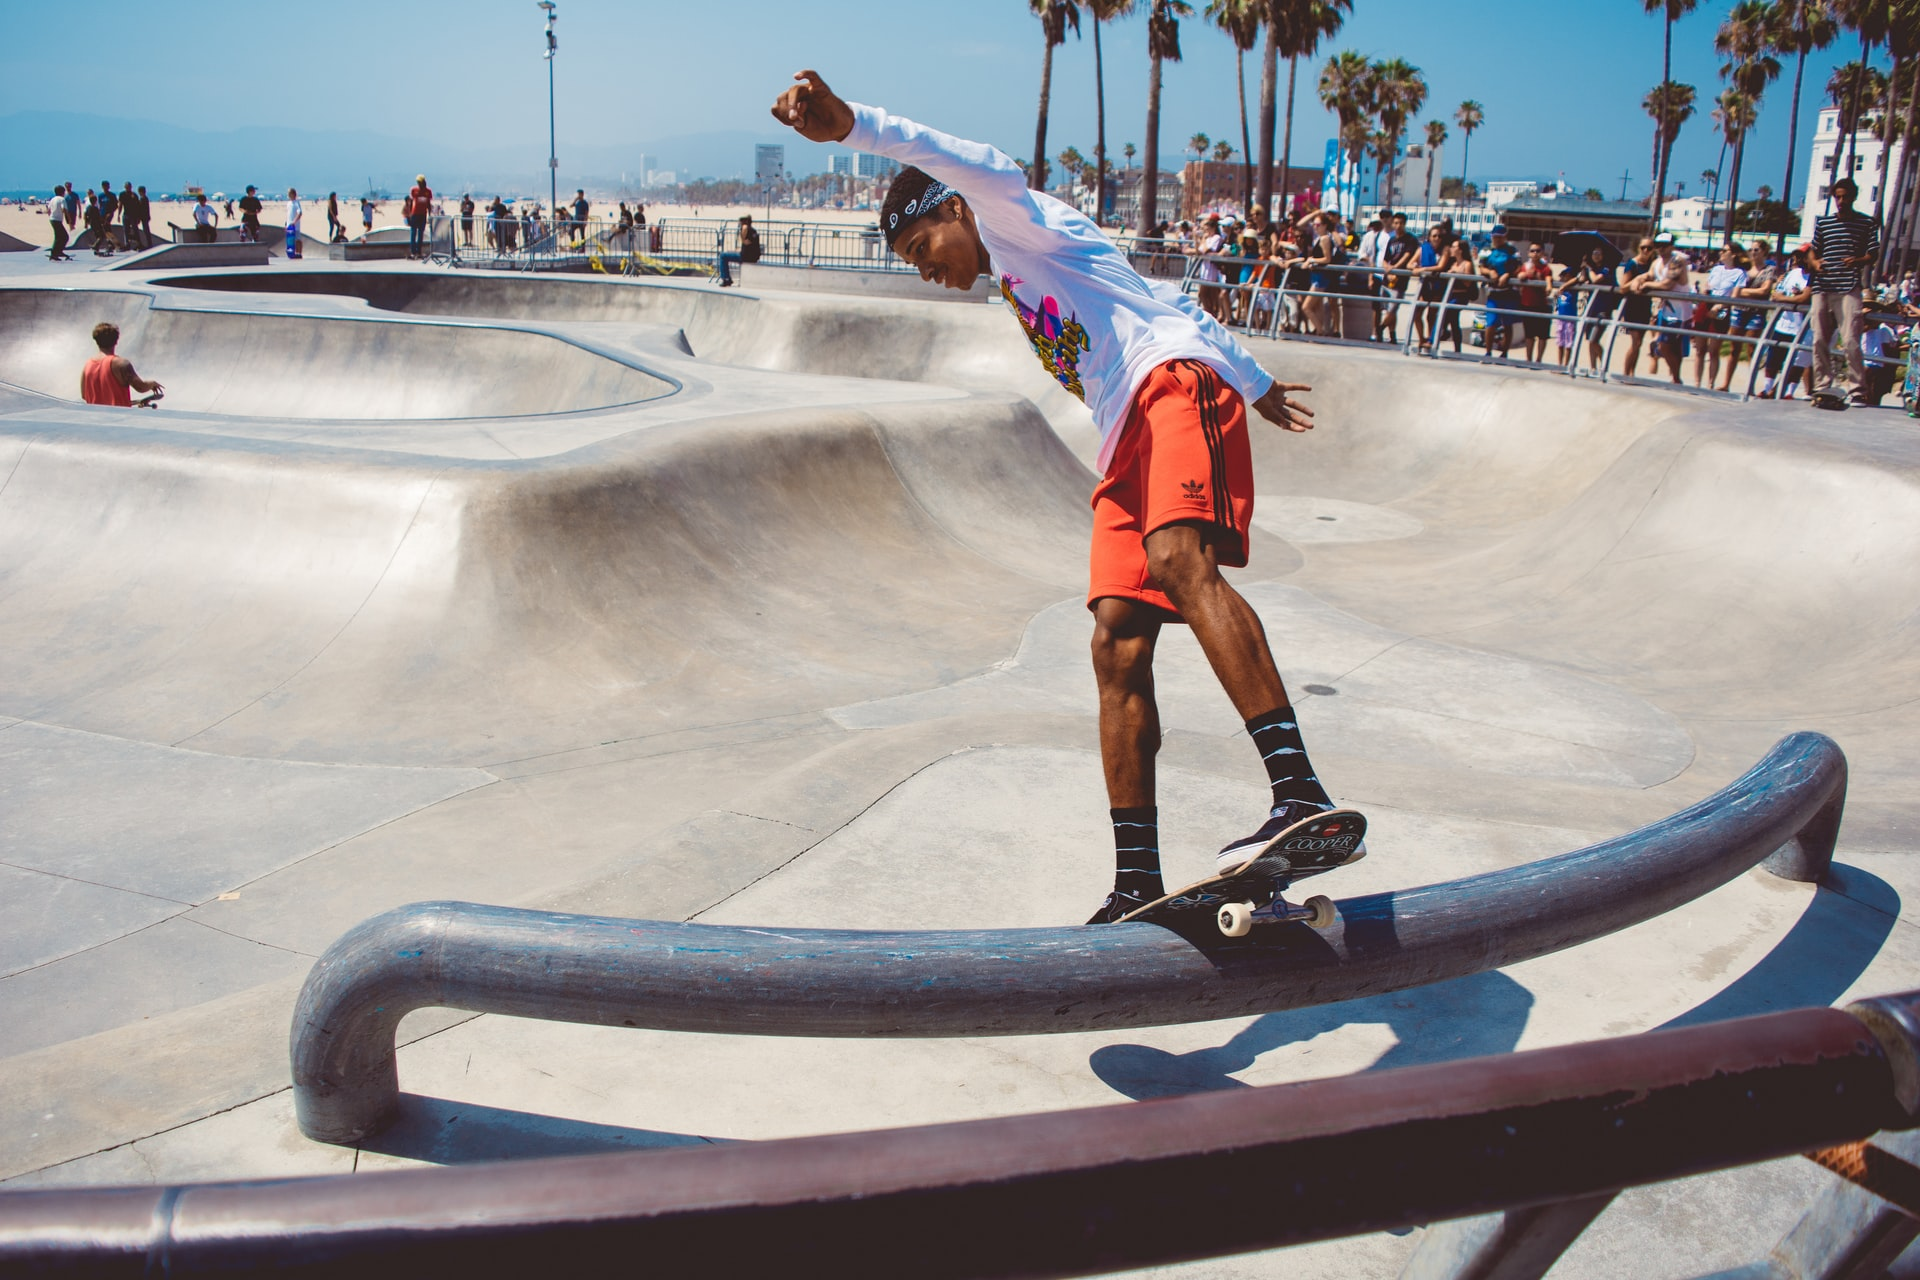 chico con tabla de skate sobre tubo